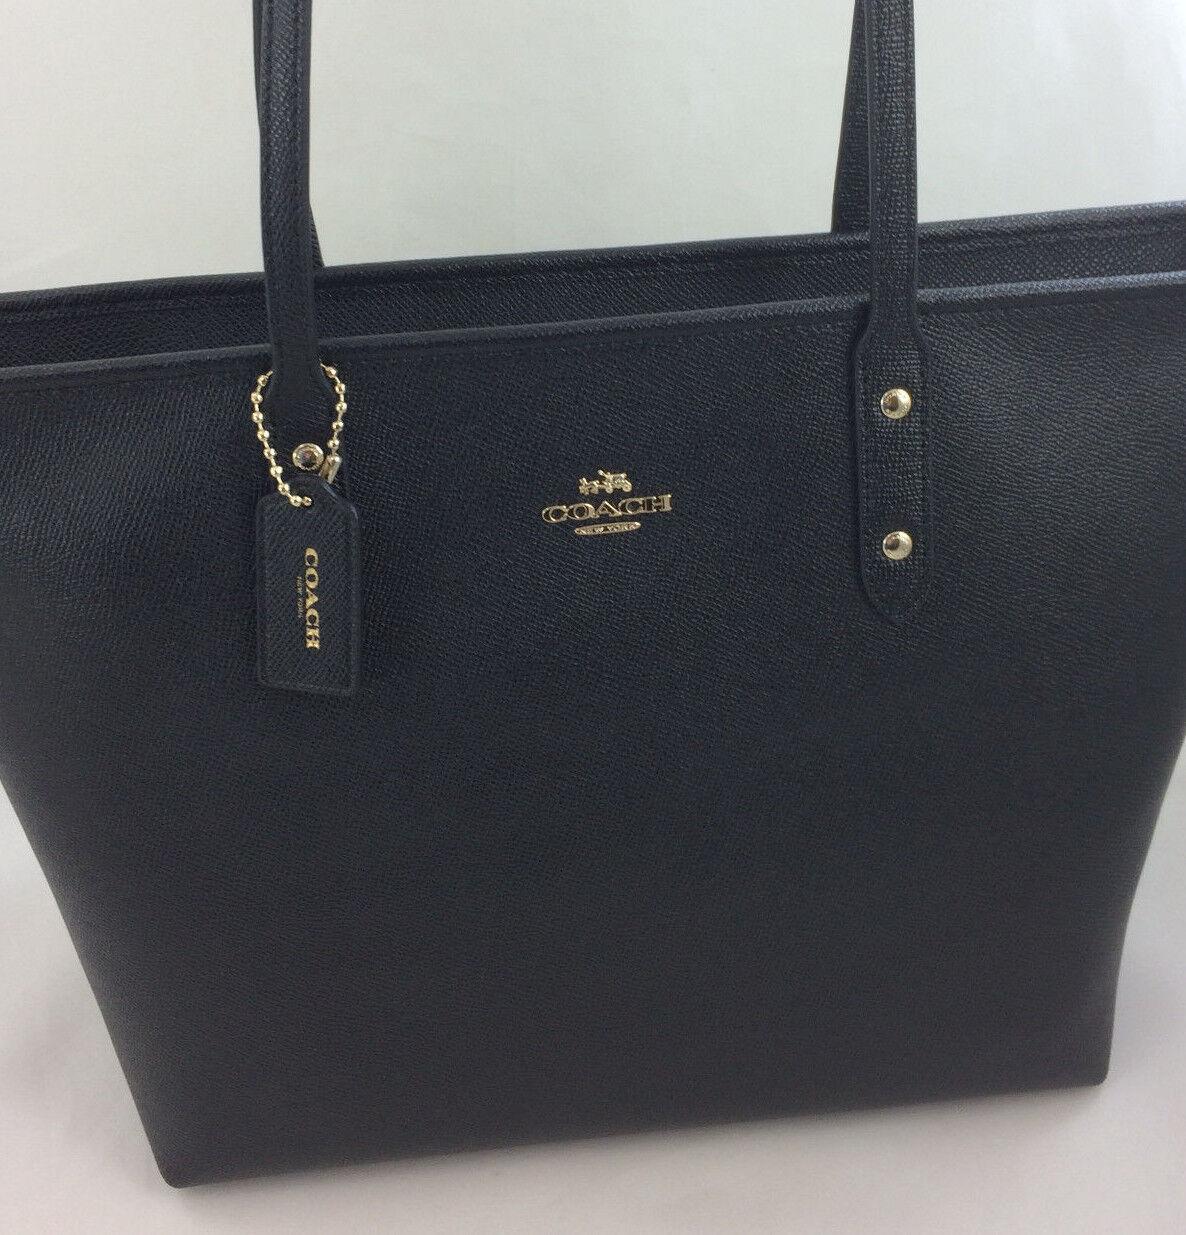 Coach - New Coach F58846 Crossgain Leather City Zip Tote Handbag Purse Bag Black